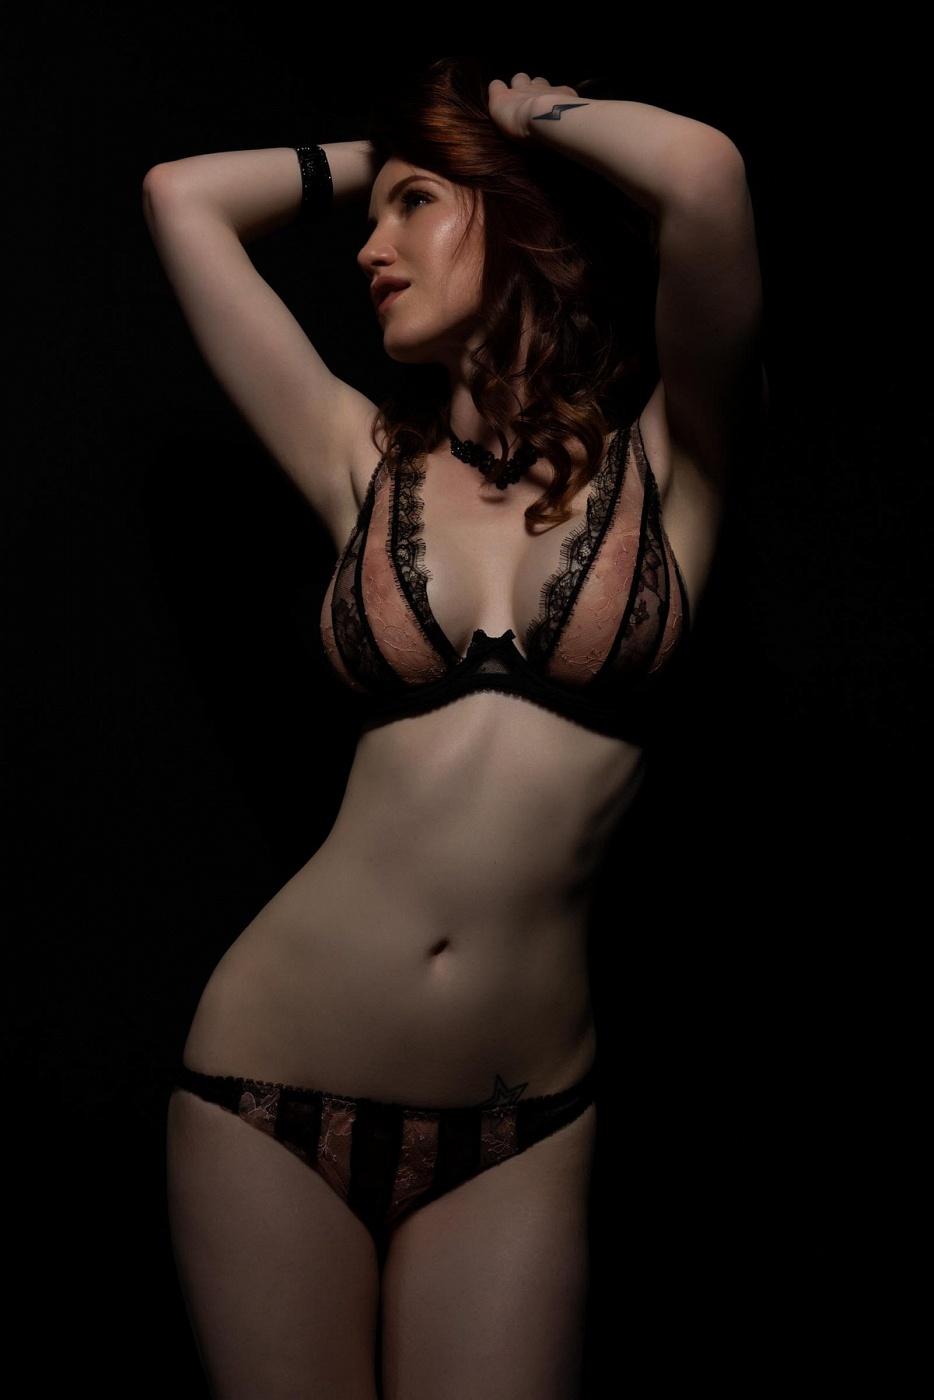 naked pics of christie brimberry